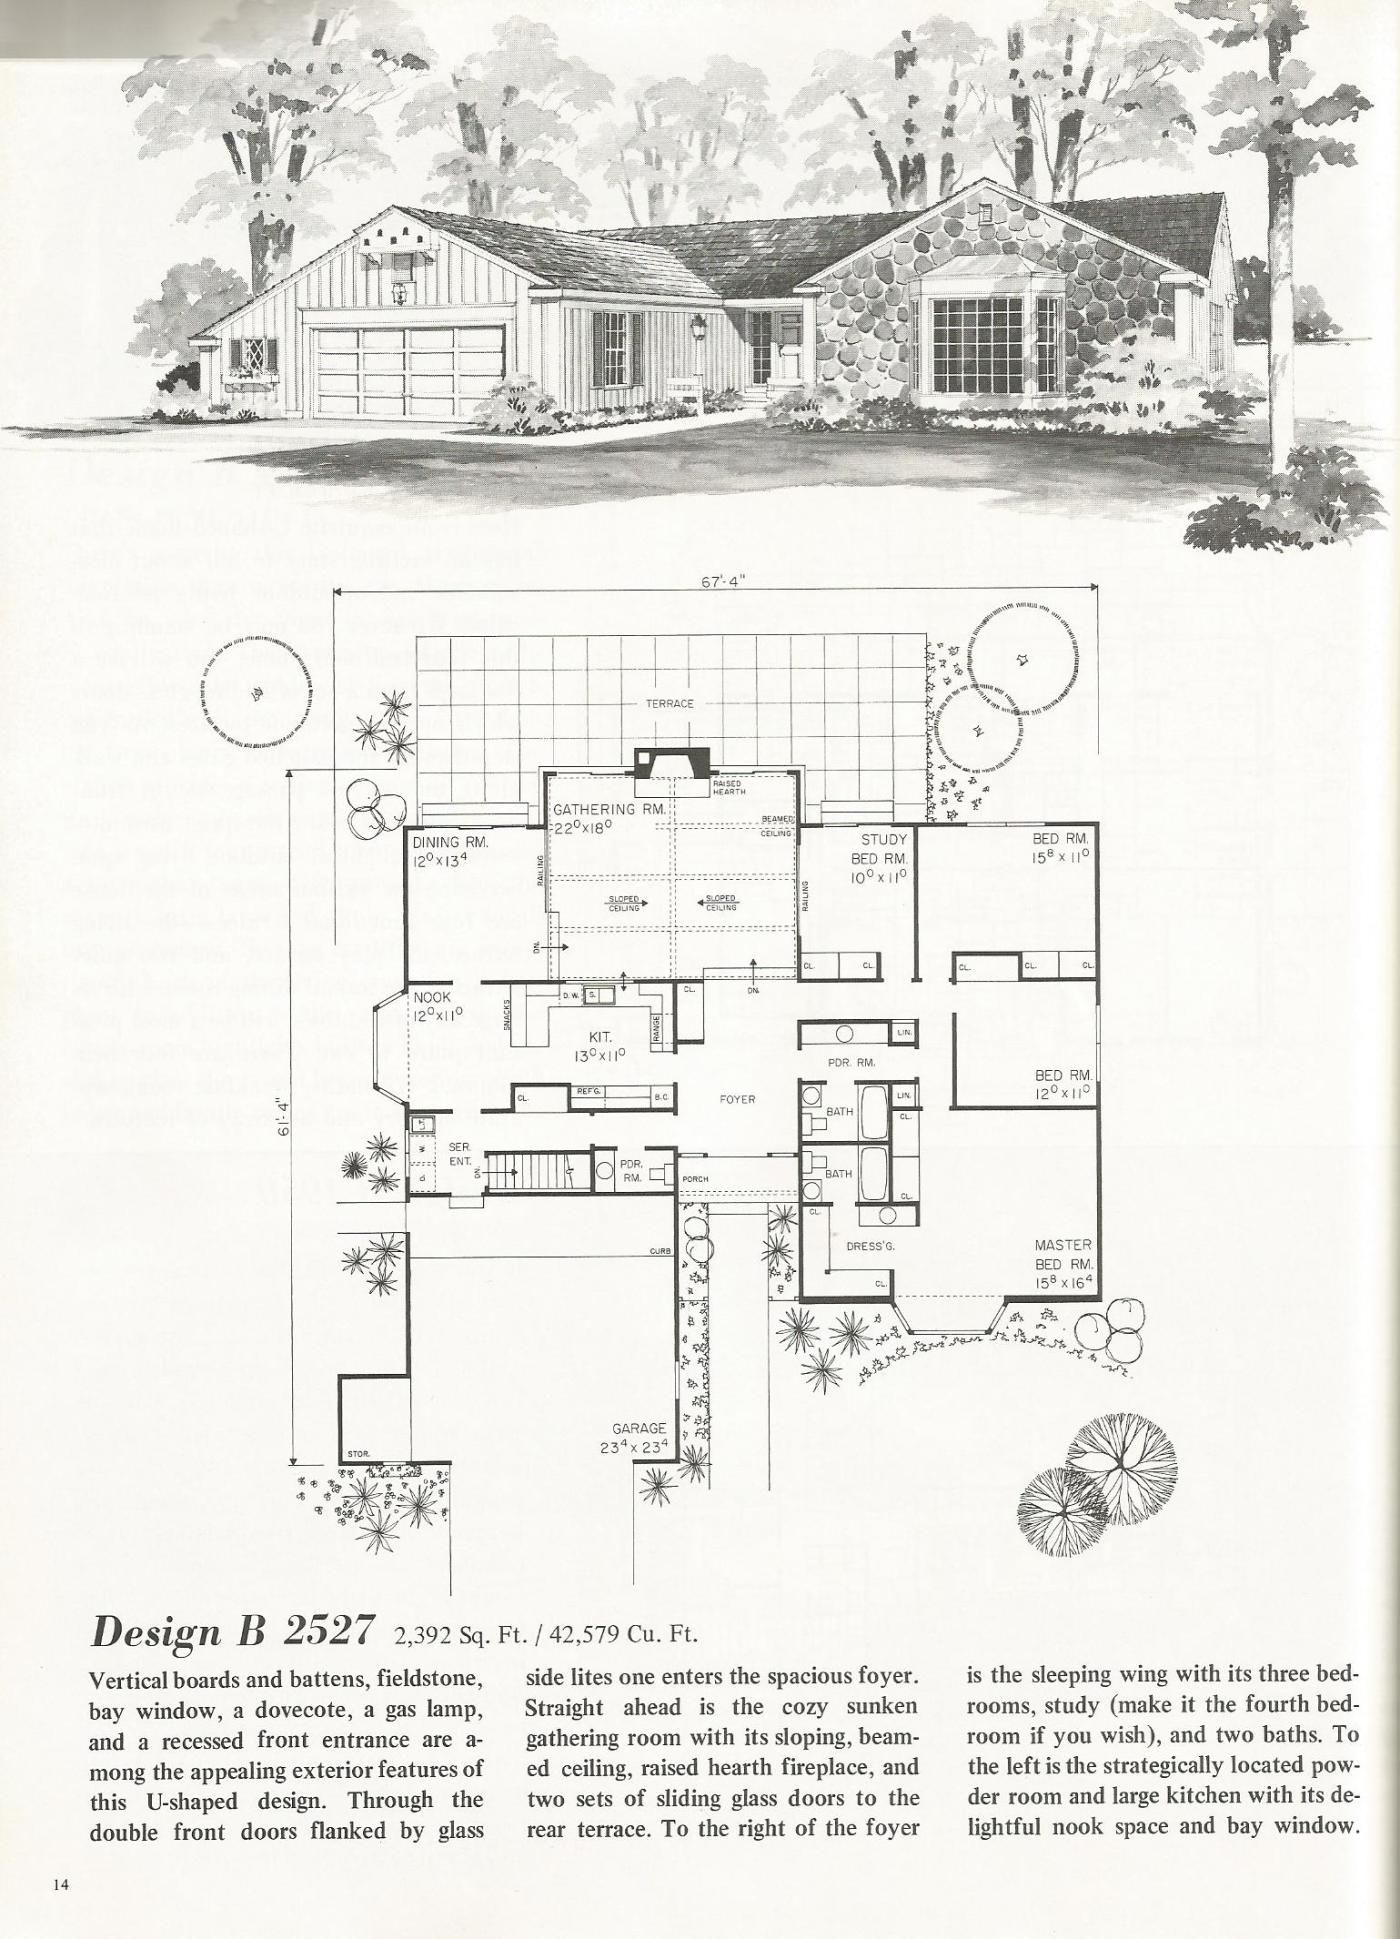 Vintage House Plans: U Shaped Homes Over 2000 Square Feet